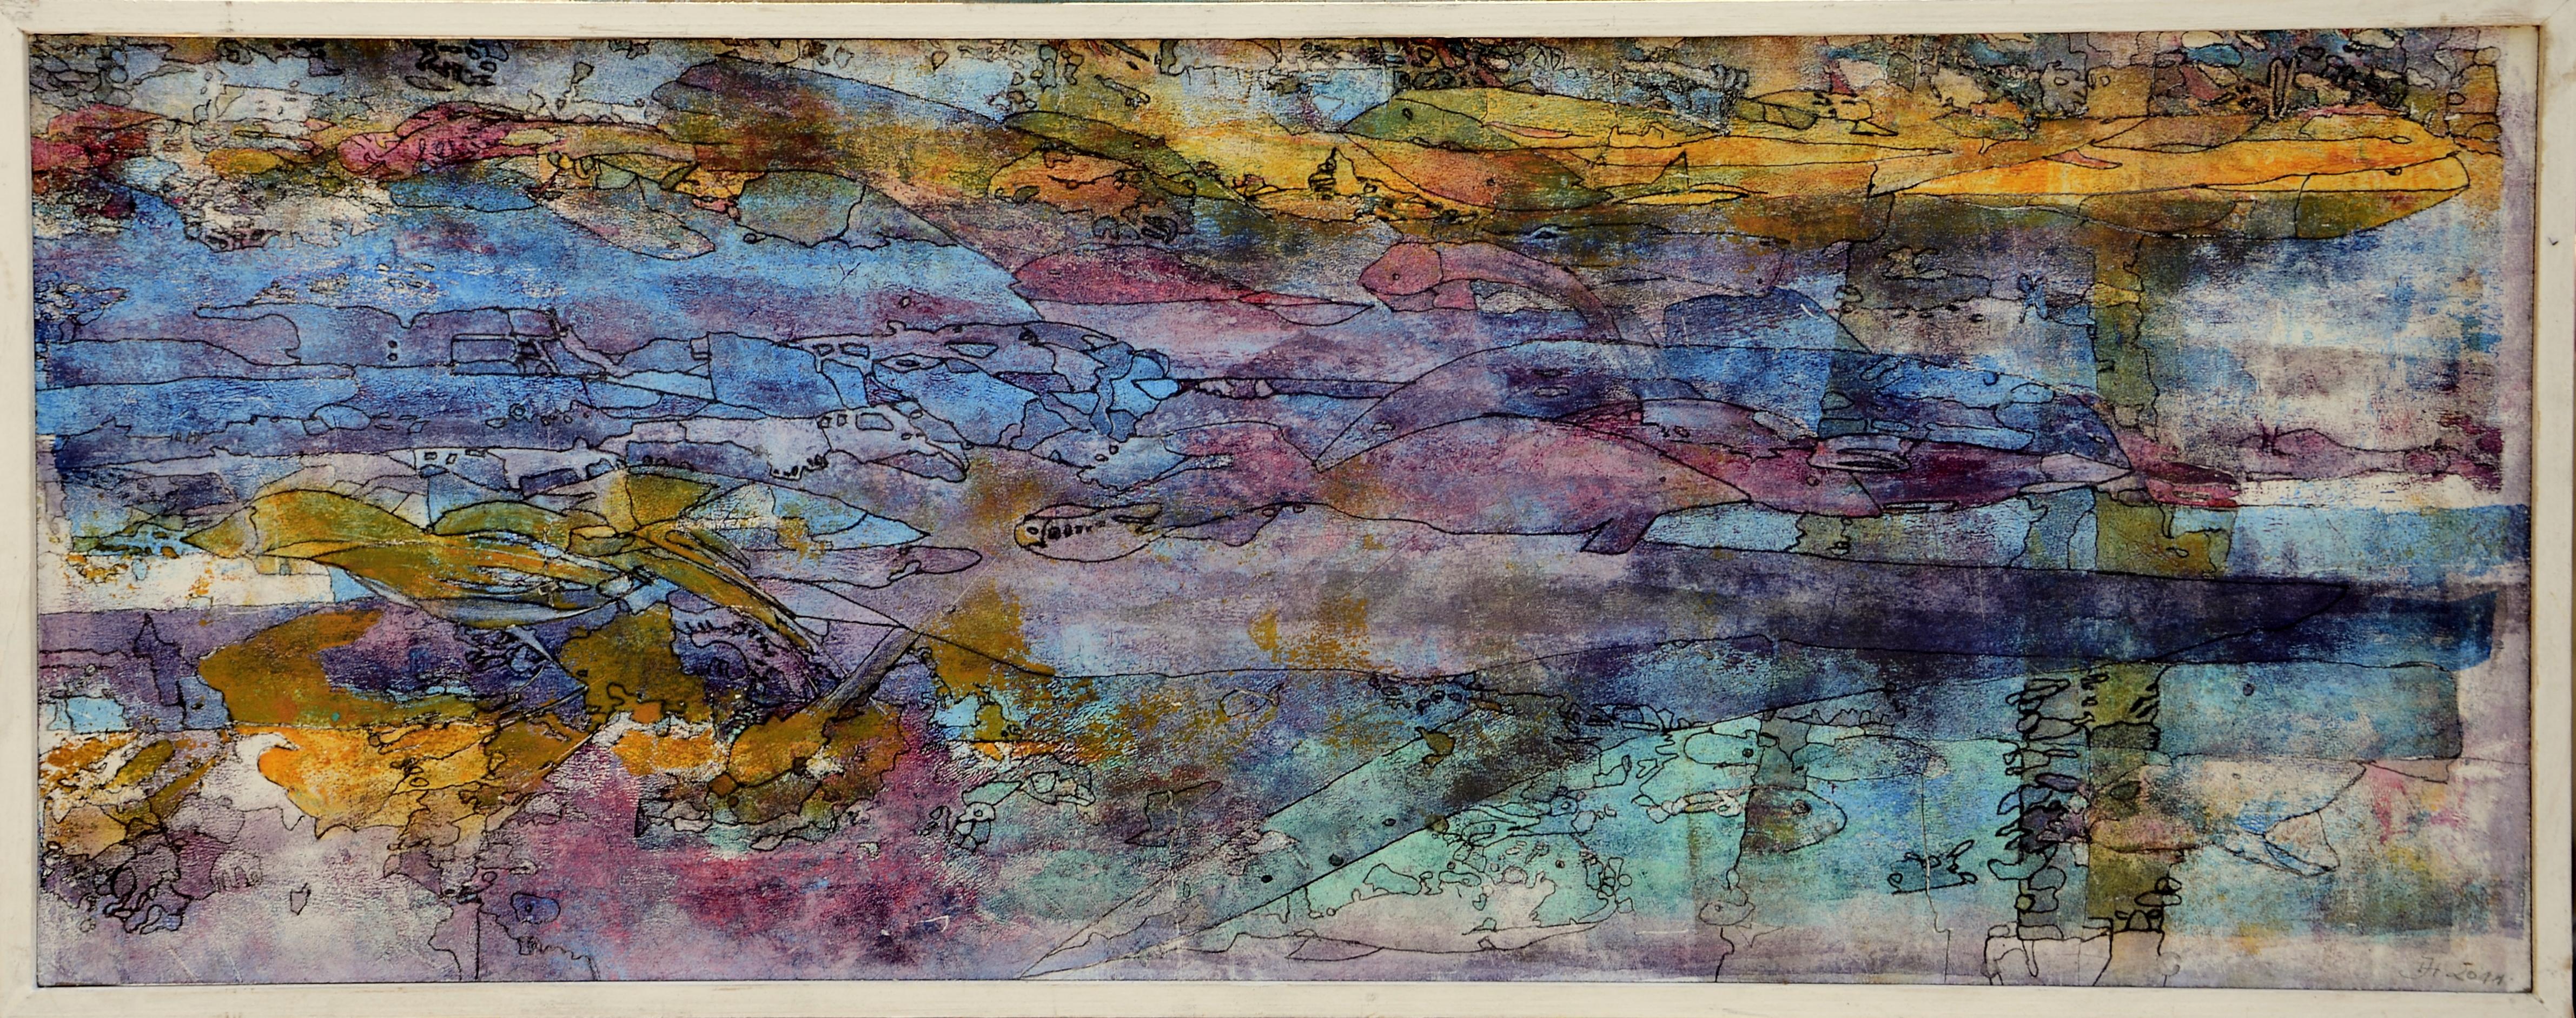 meereswelten,67 x26 cm acryl auf MDF,2011